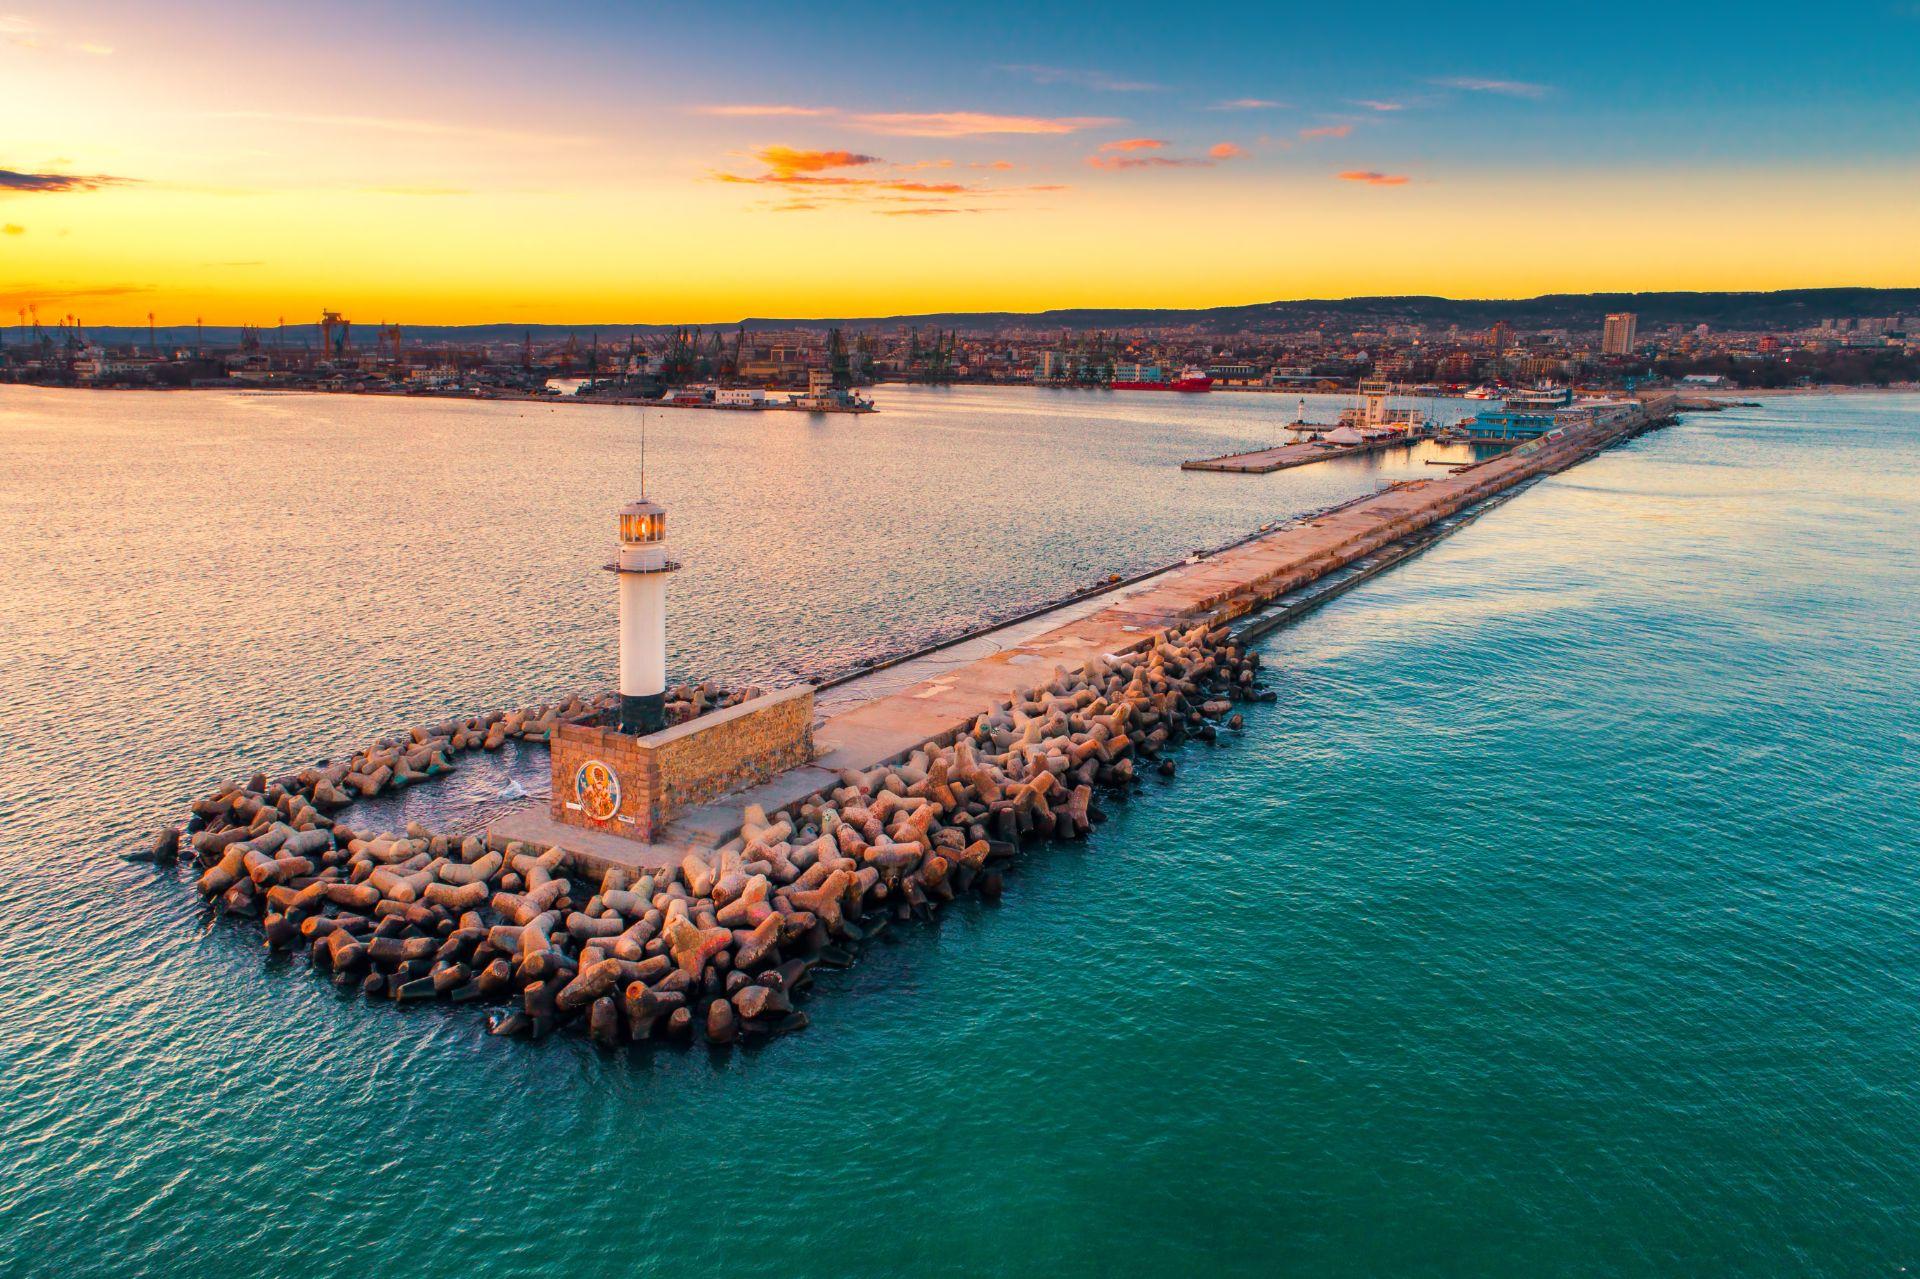 varna-bulgaria-mtlg-meetologue-sea-scenic-view-lighthouse